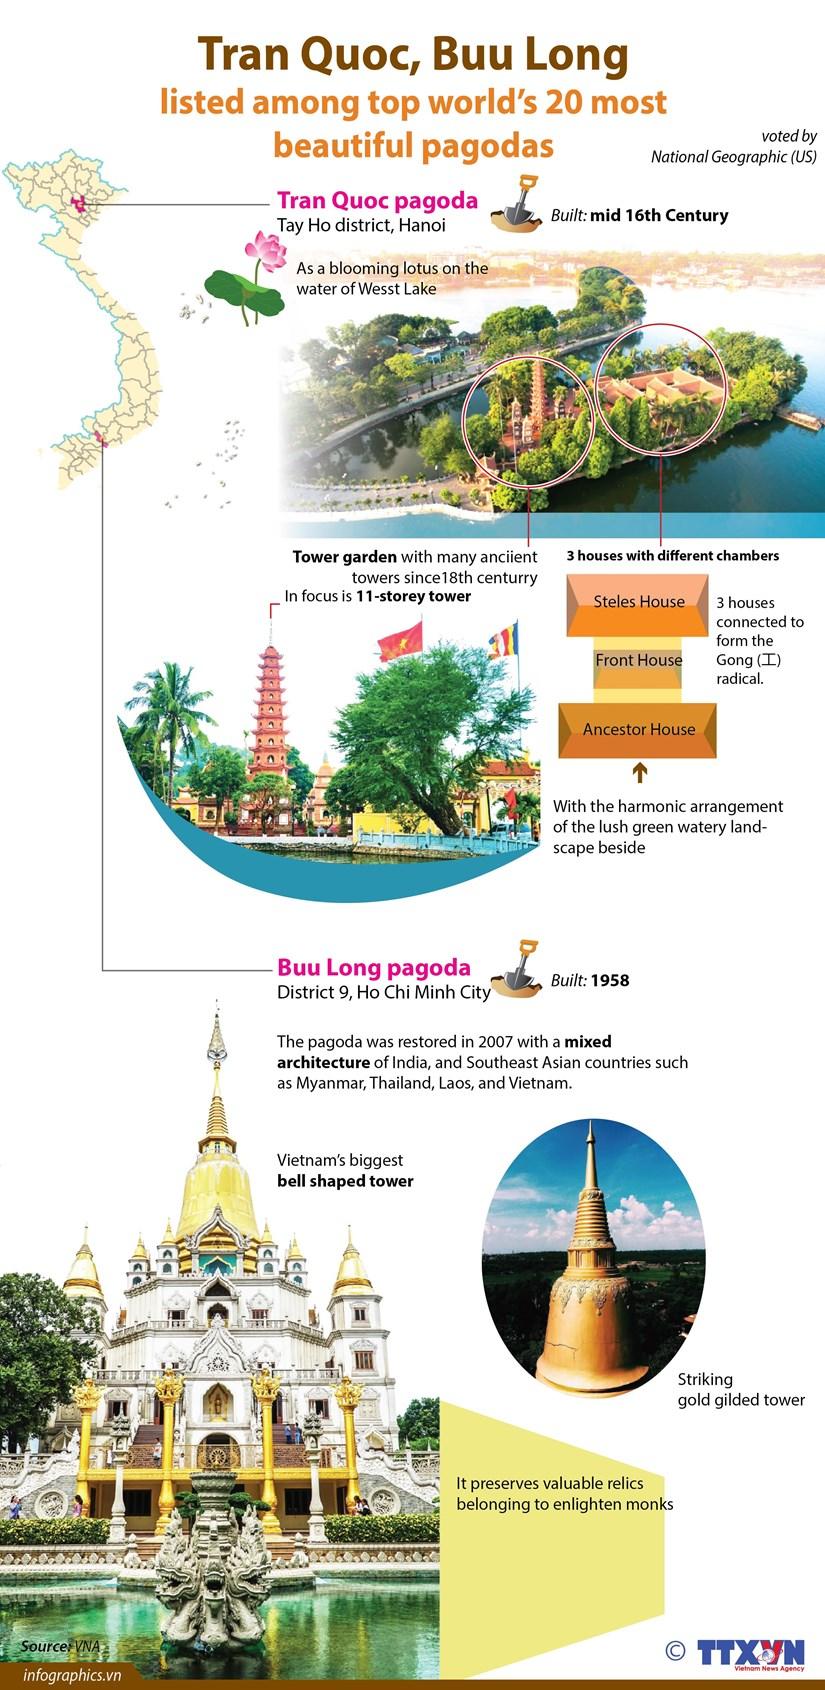 Tran Quoc, Buu Long among top world's 20 most beautiful pagodas hinh anh 1